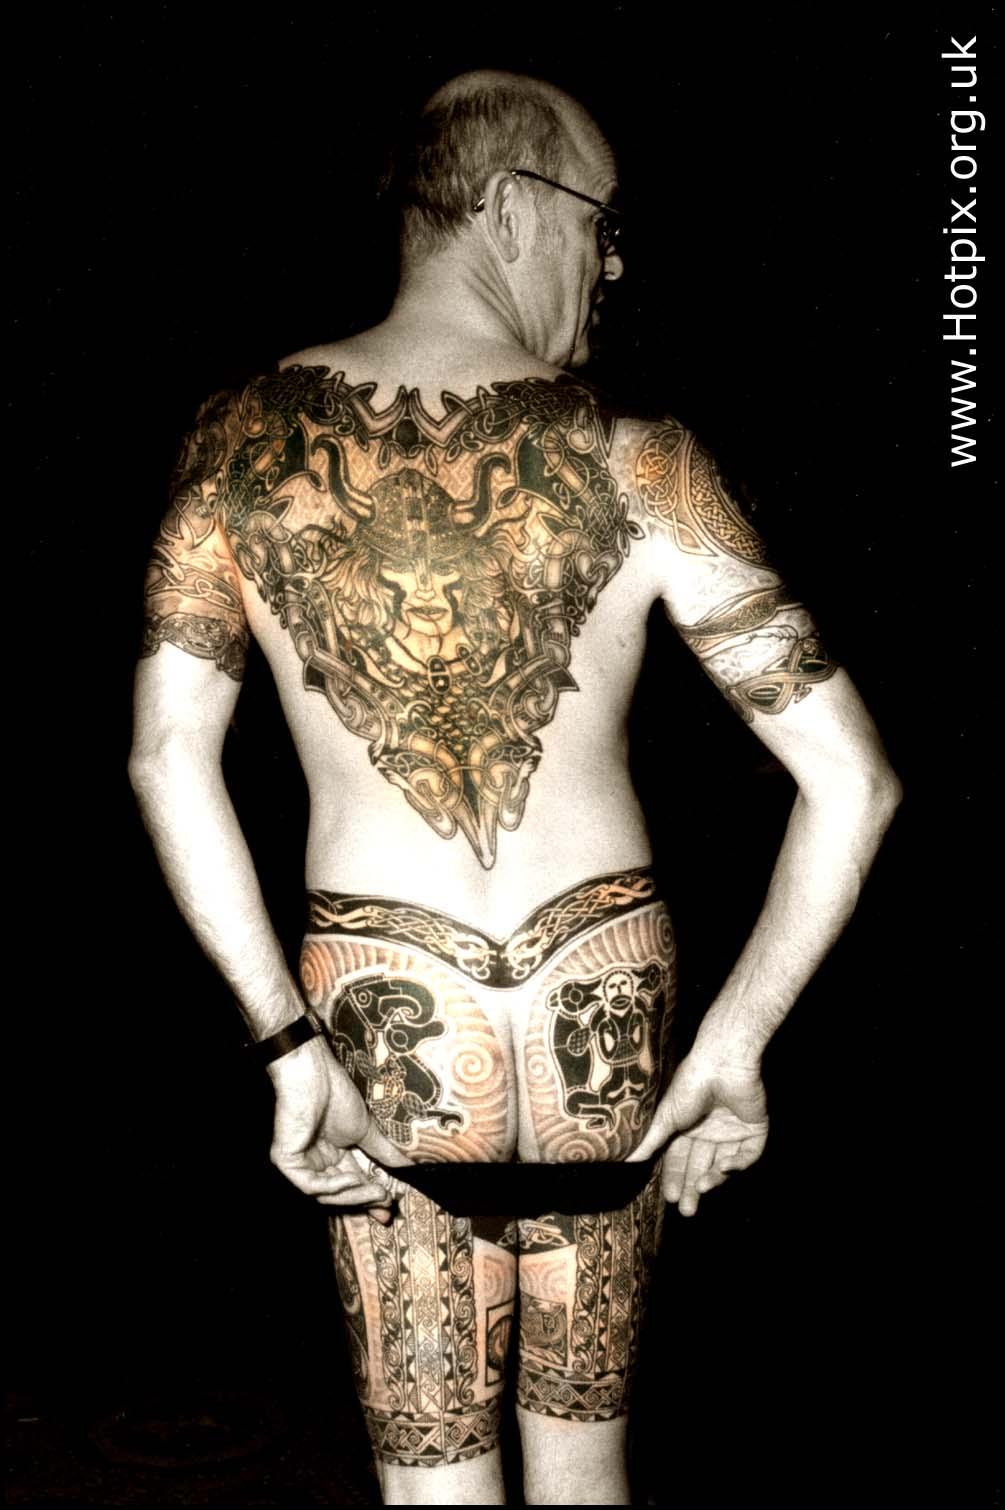 tattoo,tatoo,tat2,ink,skin,design,england,english,british,UK,man,male,back,face,leg,thigh,black,white,selective,color,colour,colores,sepia,convention,expo,exhibition,circuit,herts,tonysmith,tony,smith,Tatuada,tatto,tats,bodyart,body,art,dark,disturbia,interesting,people,person,persons,persona,interesante,tatouage,selectivo,couleur,s\u00e9lective,vorgew\u00e4hlte,Farbe,HOT PIX,tony smith photography,tdktony,tdk,tdktonysmith